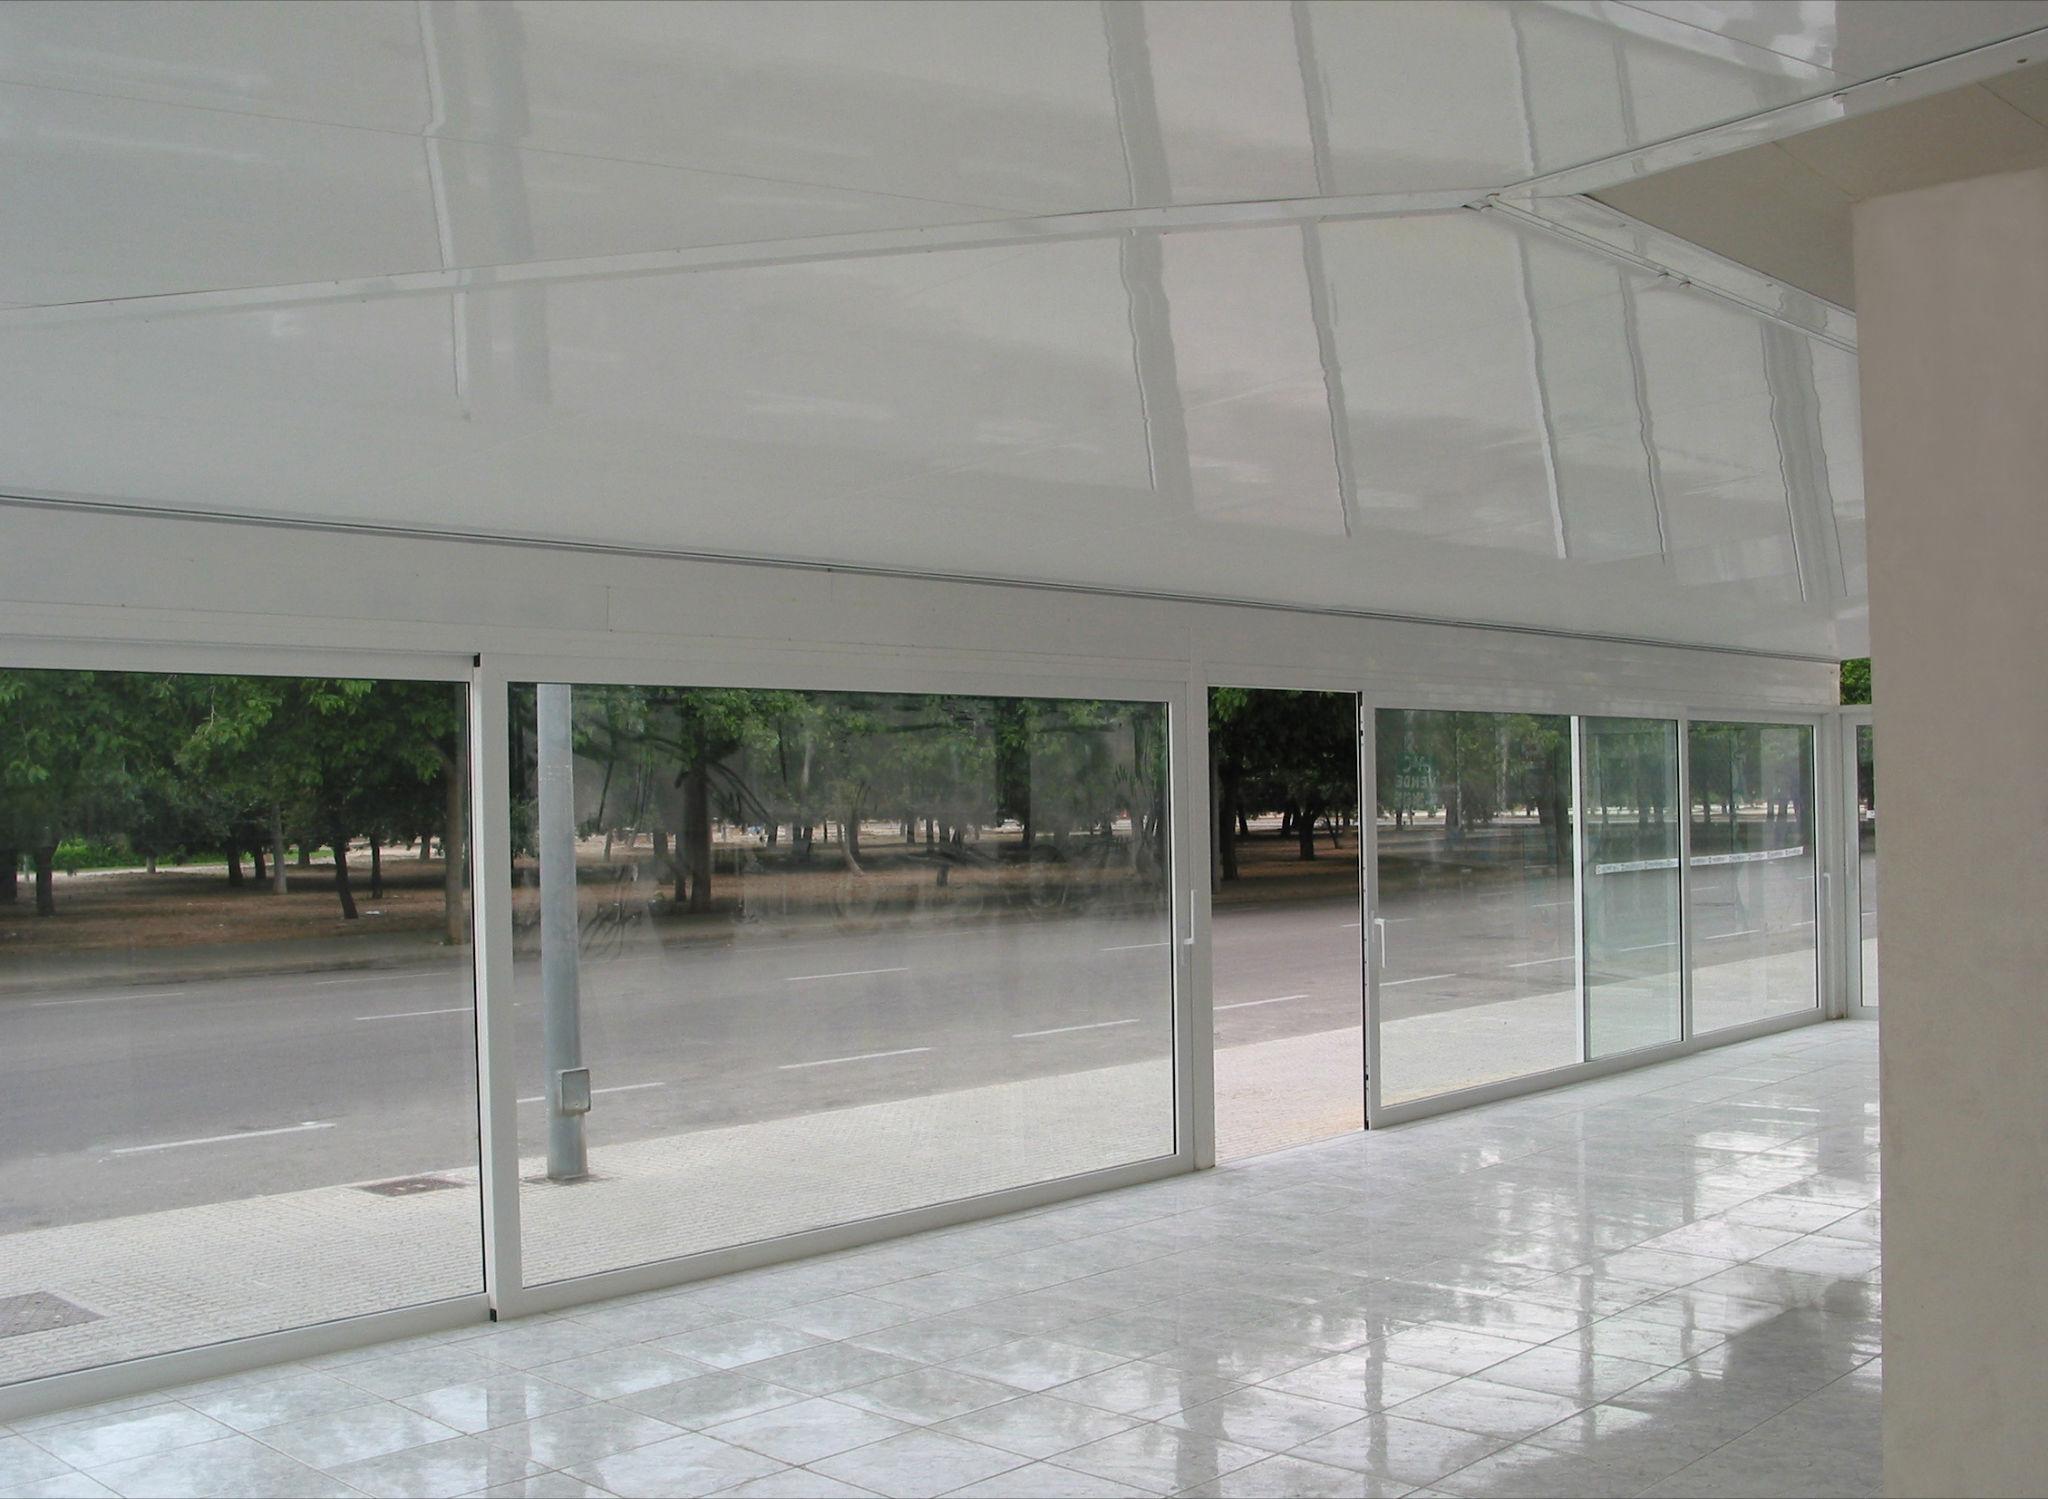 Foto 24 de Carpintería de aluminio, metálica y PVC en Málaga | Aluminios Alunoe